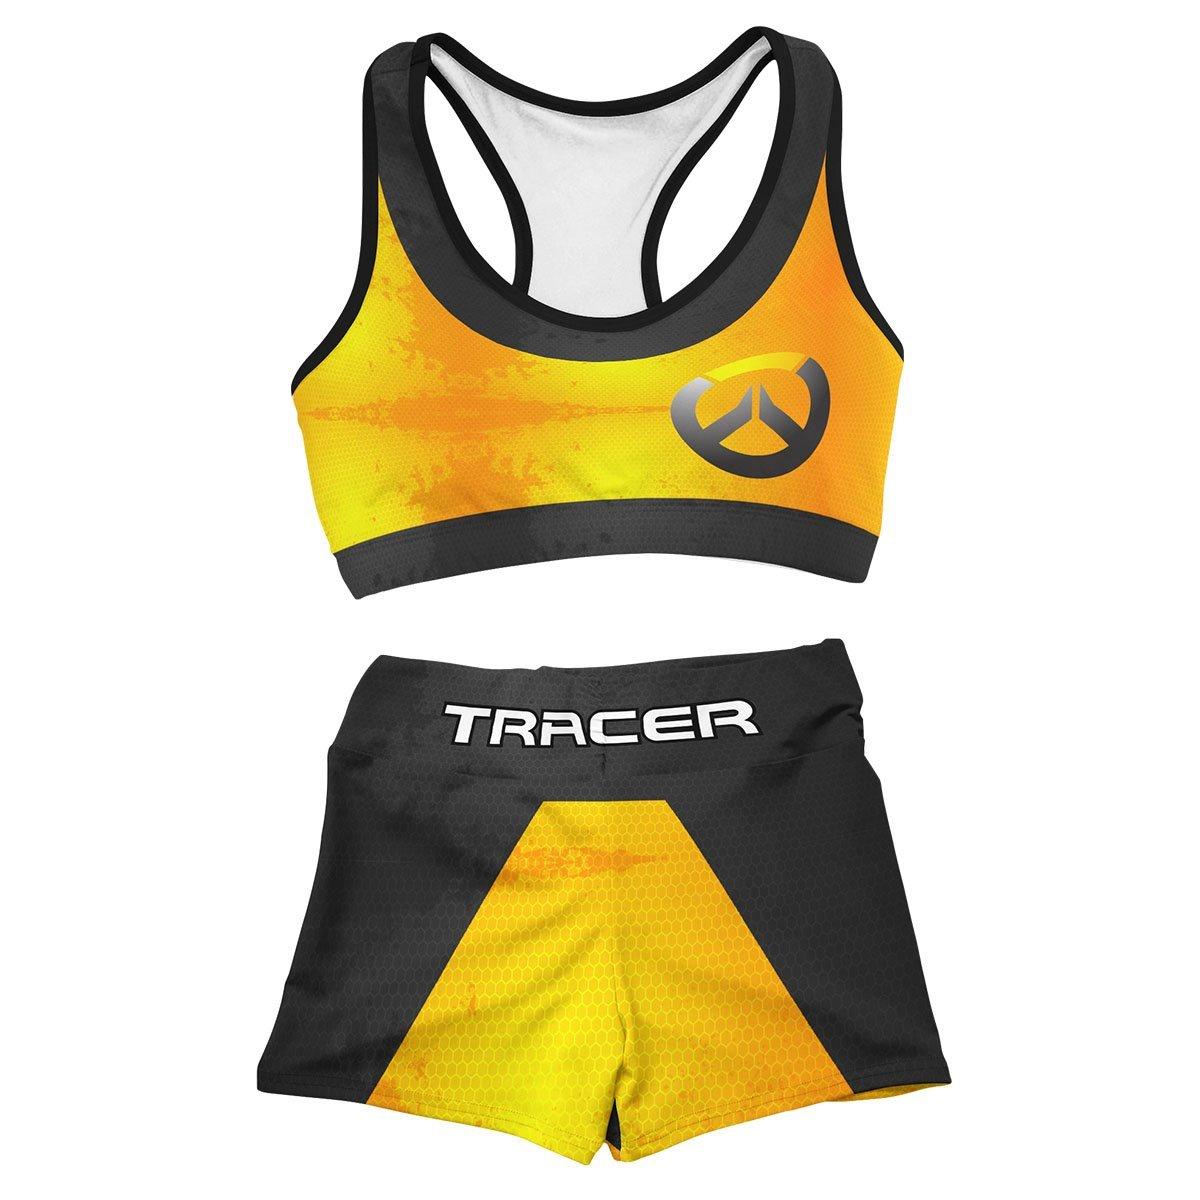 Tracer Summer Active Wear Set FDM3107 Entire Set Official Anime Swimsuit Merch